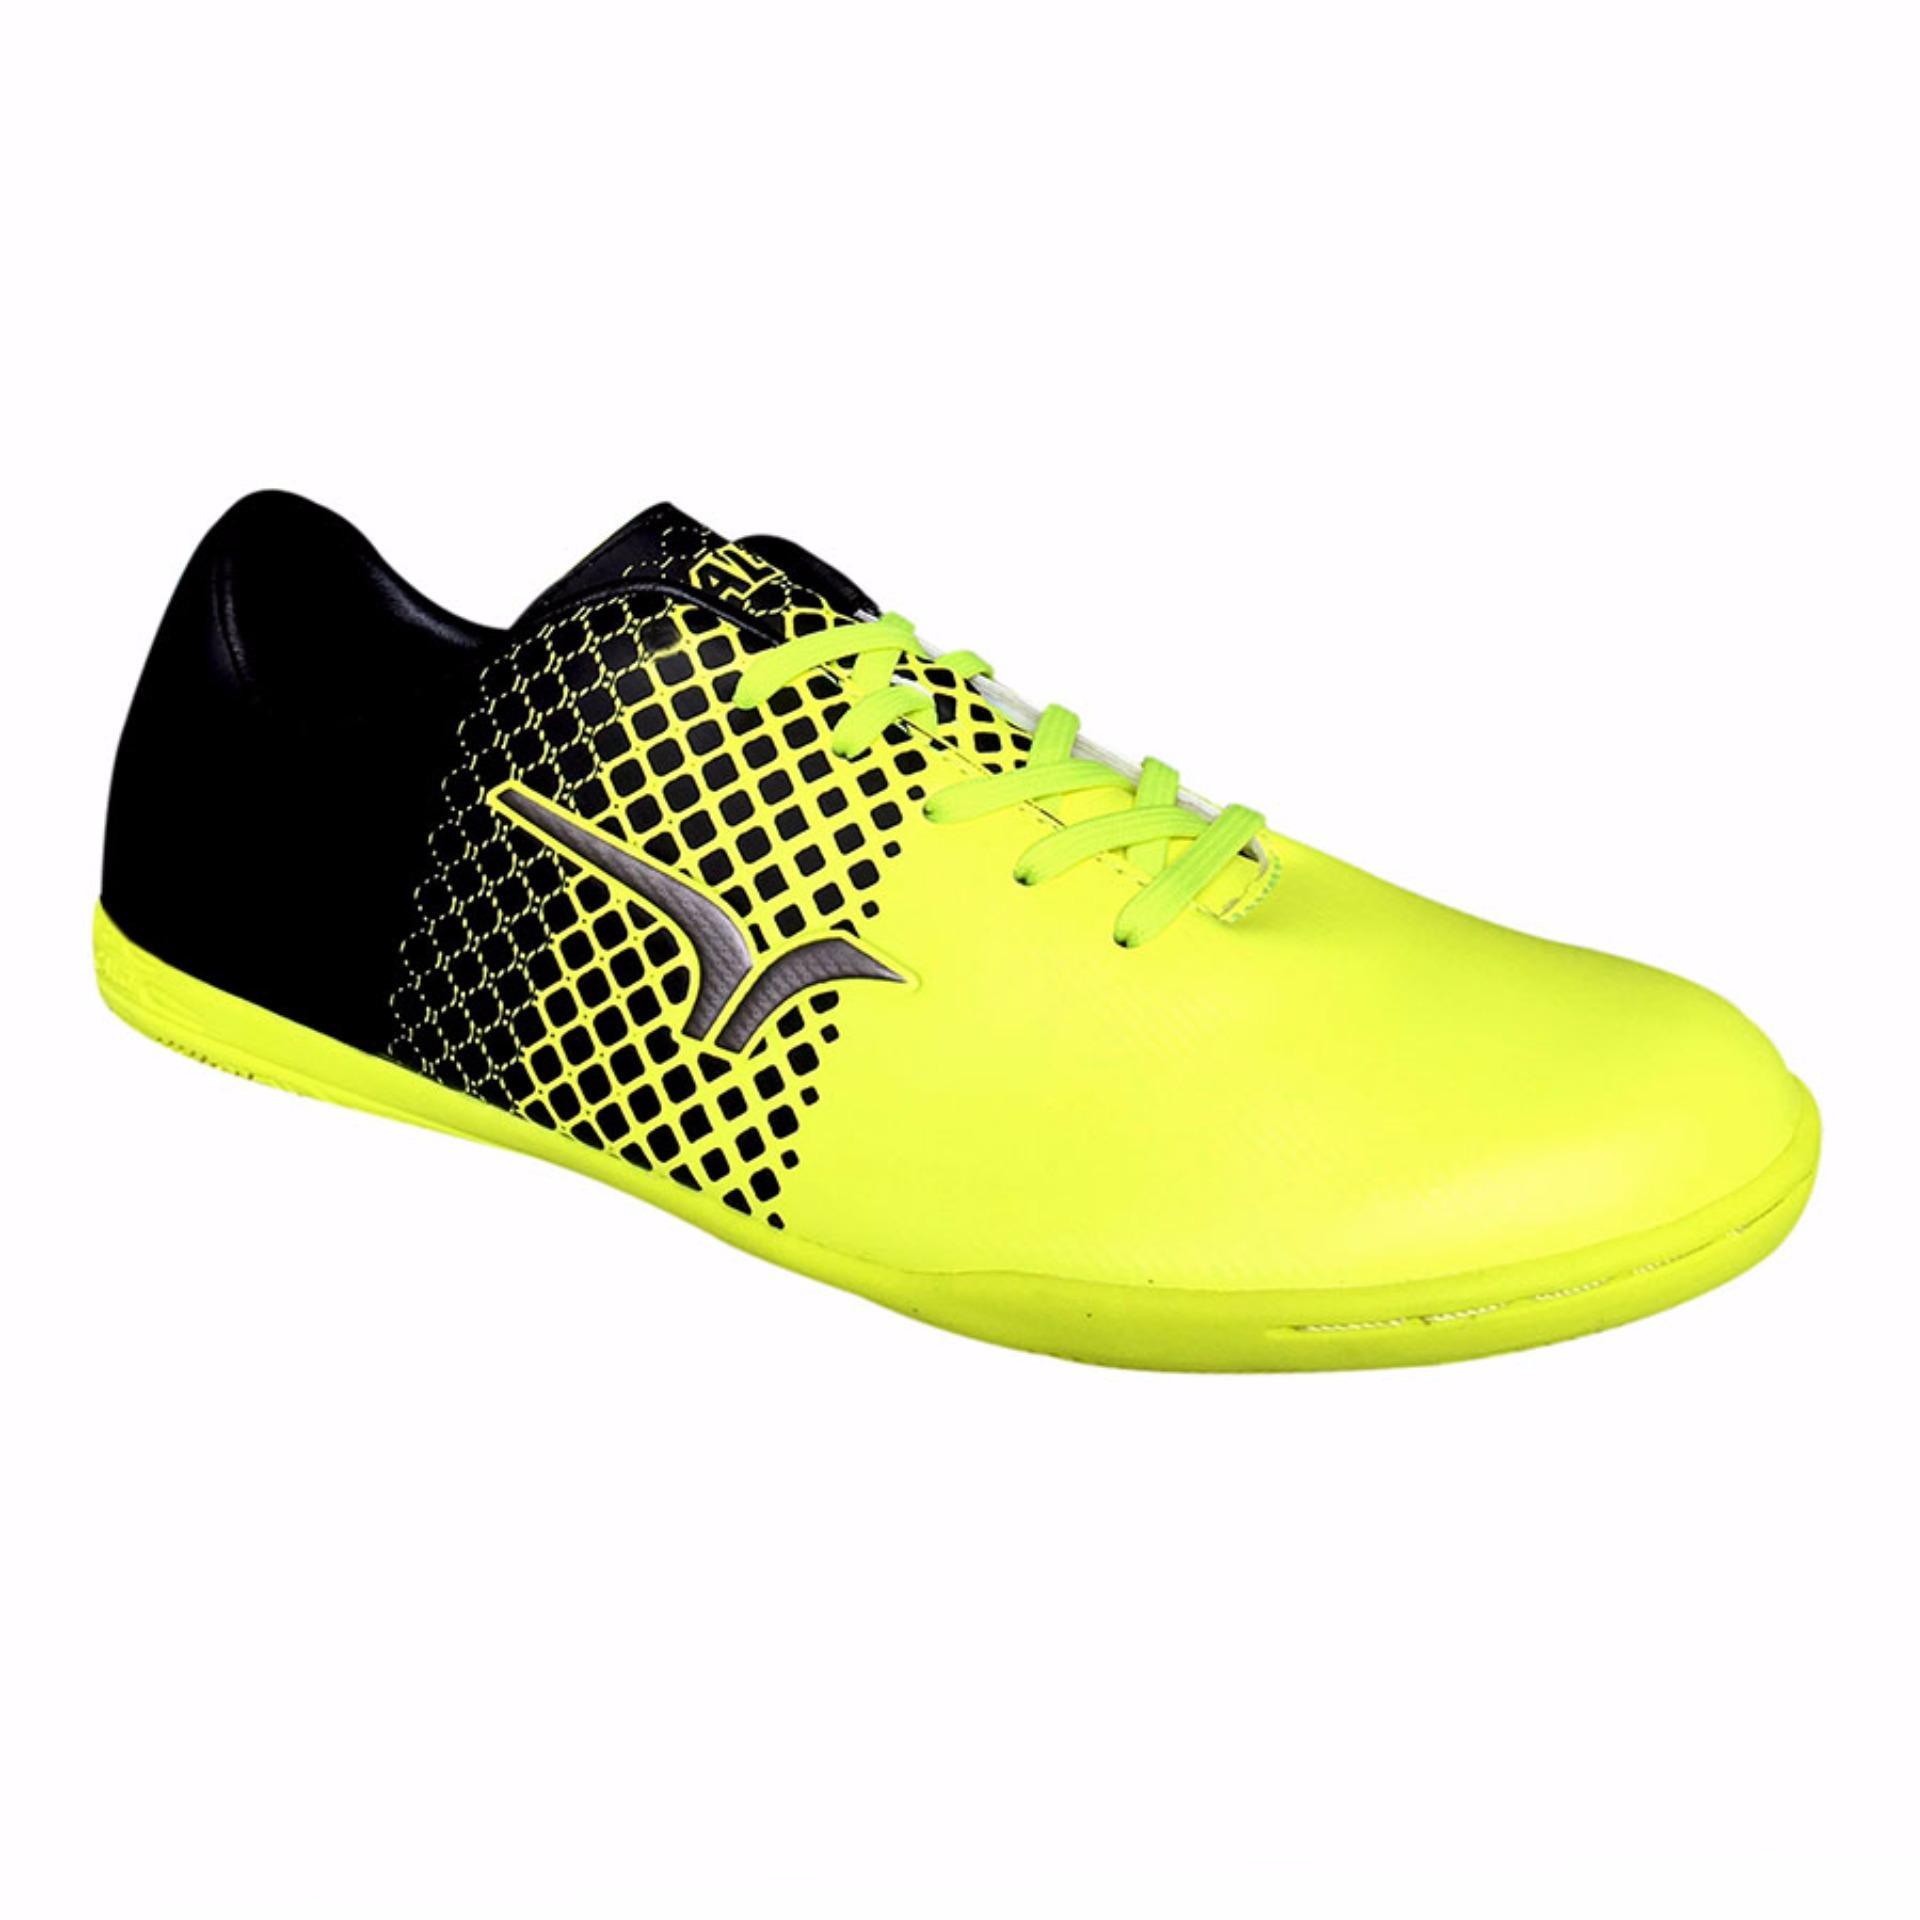 Belanja Murah Calci Sepatu Futsal Anak Anarchy Jr Volt Black Harga Mizuno Sala Classic 2 In Yellow